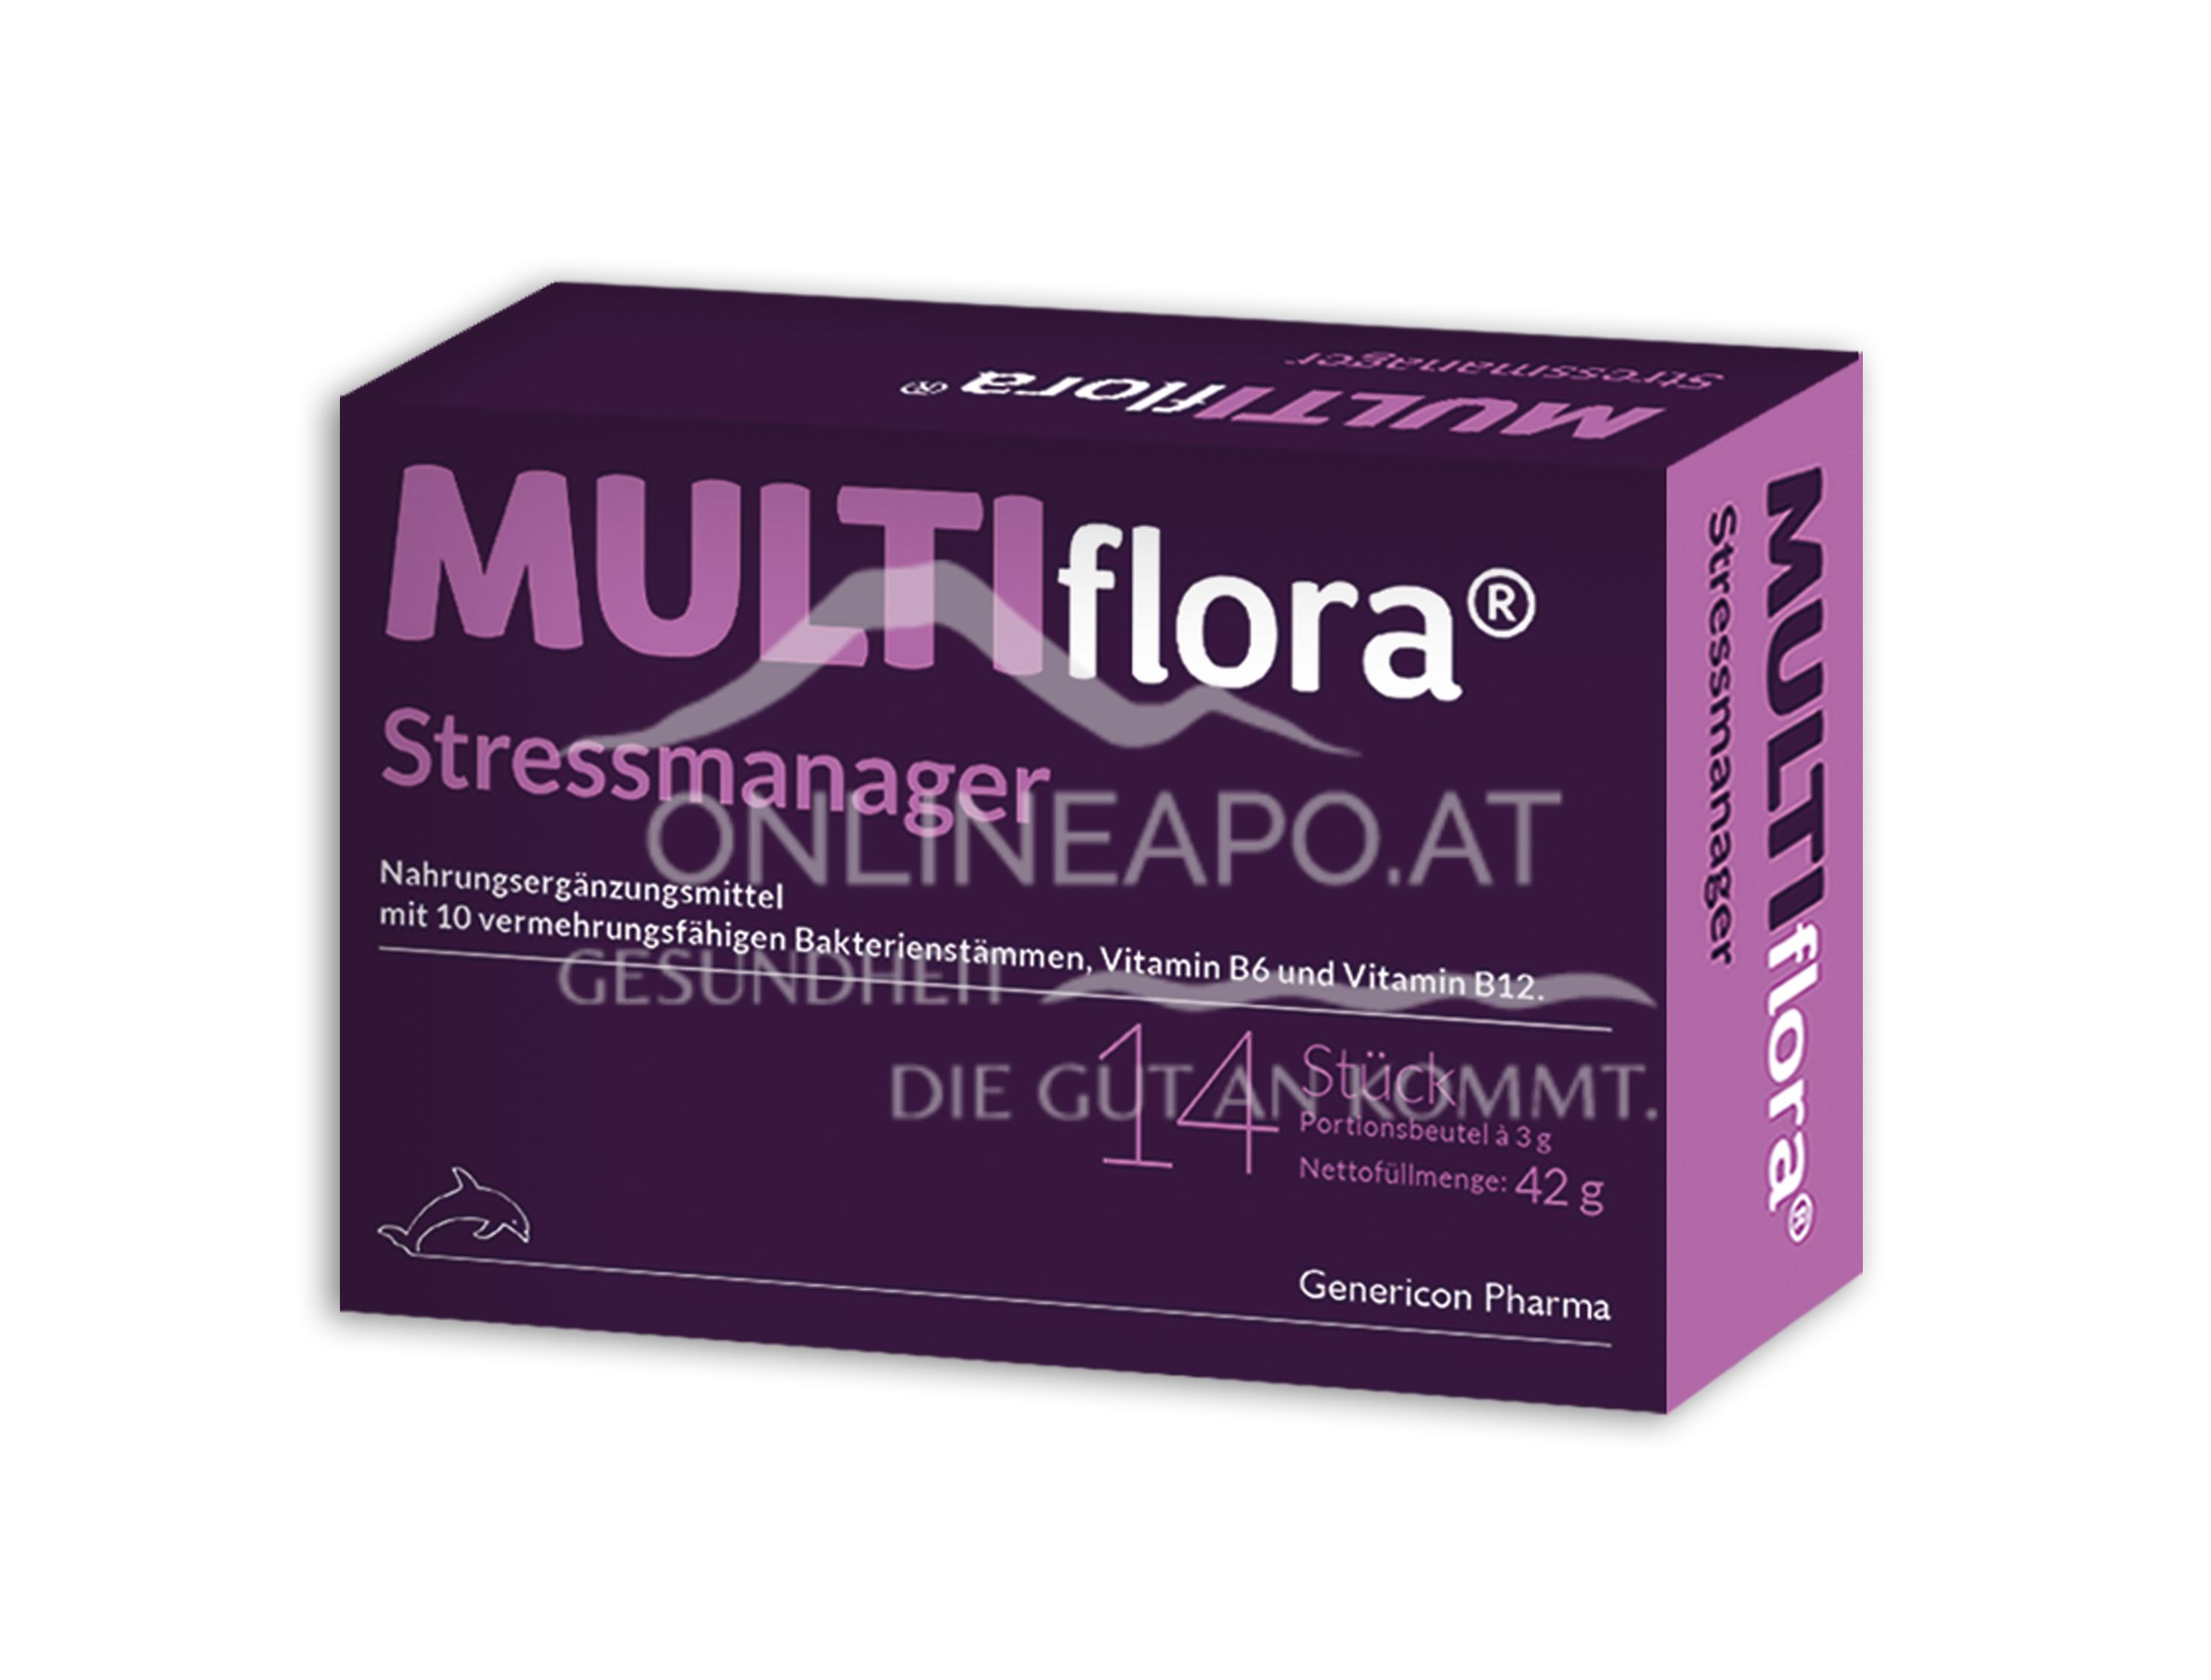 MULTIflora® Stressmanager